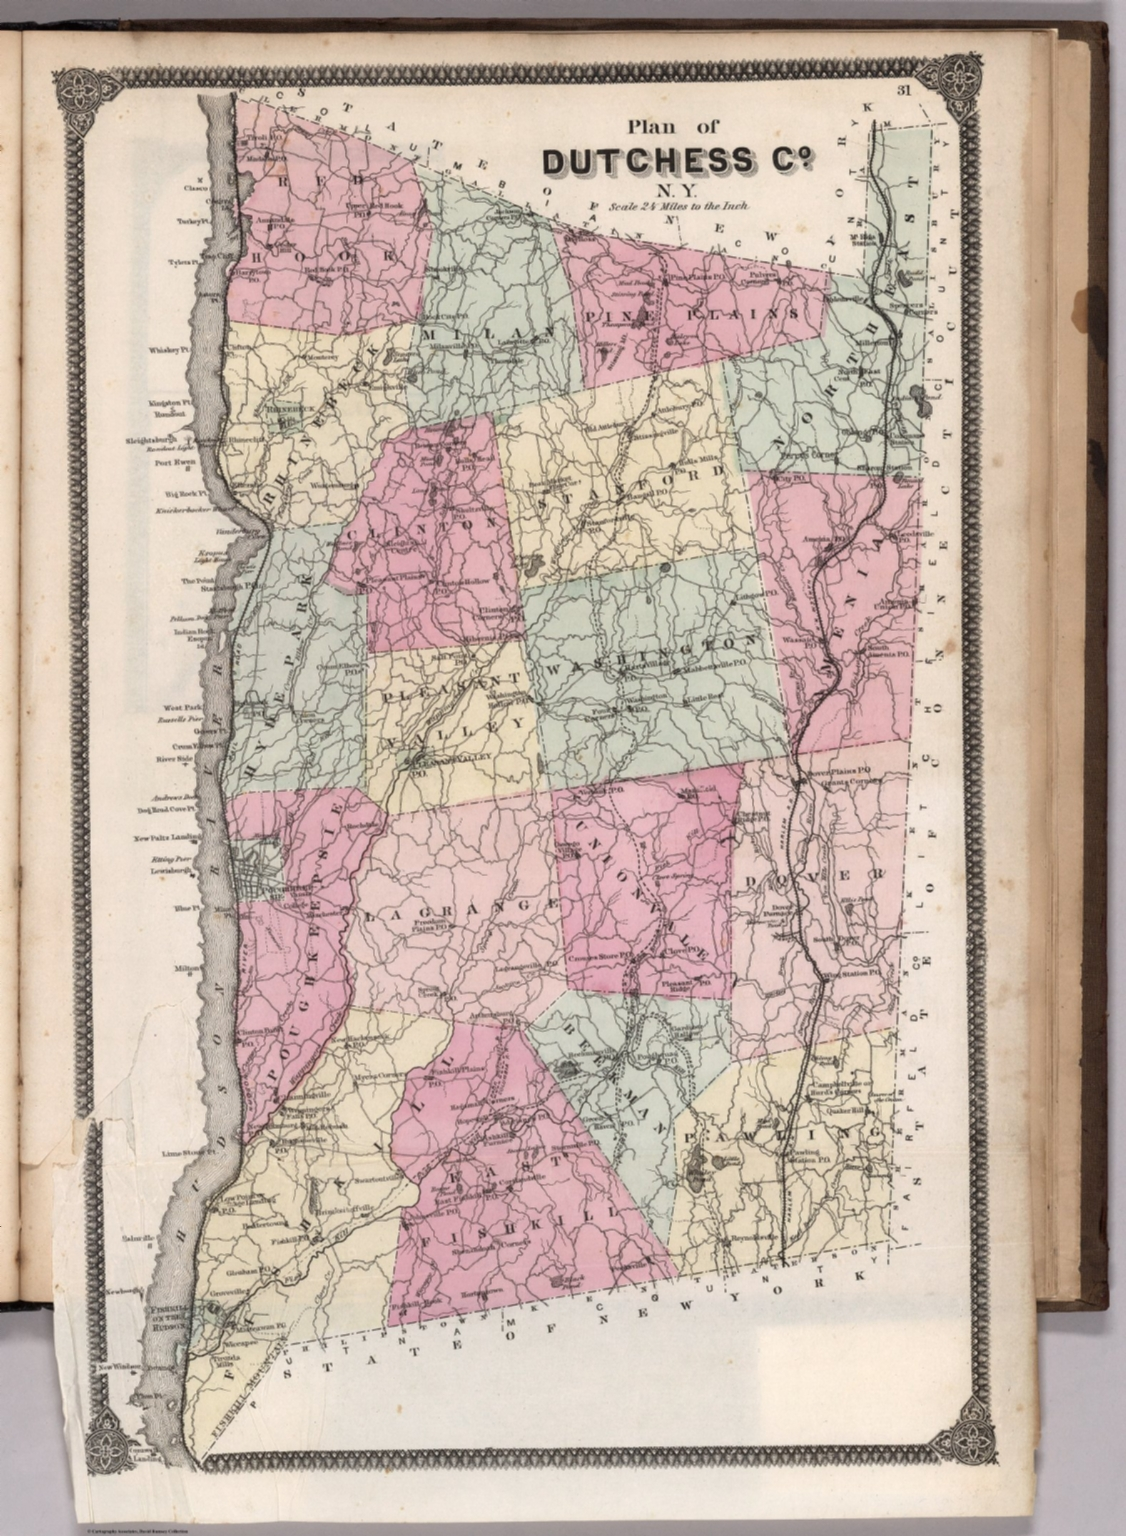 Plan of Dutchess County, New York.